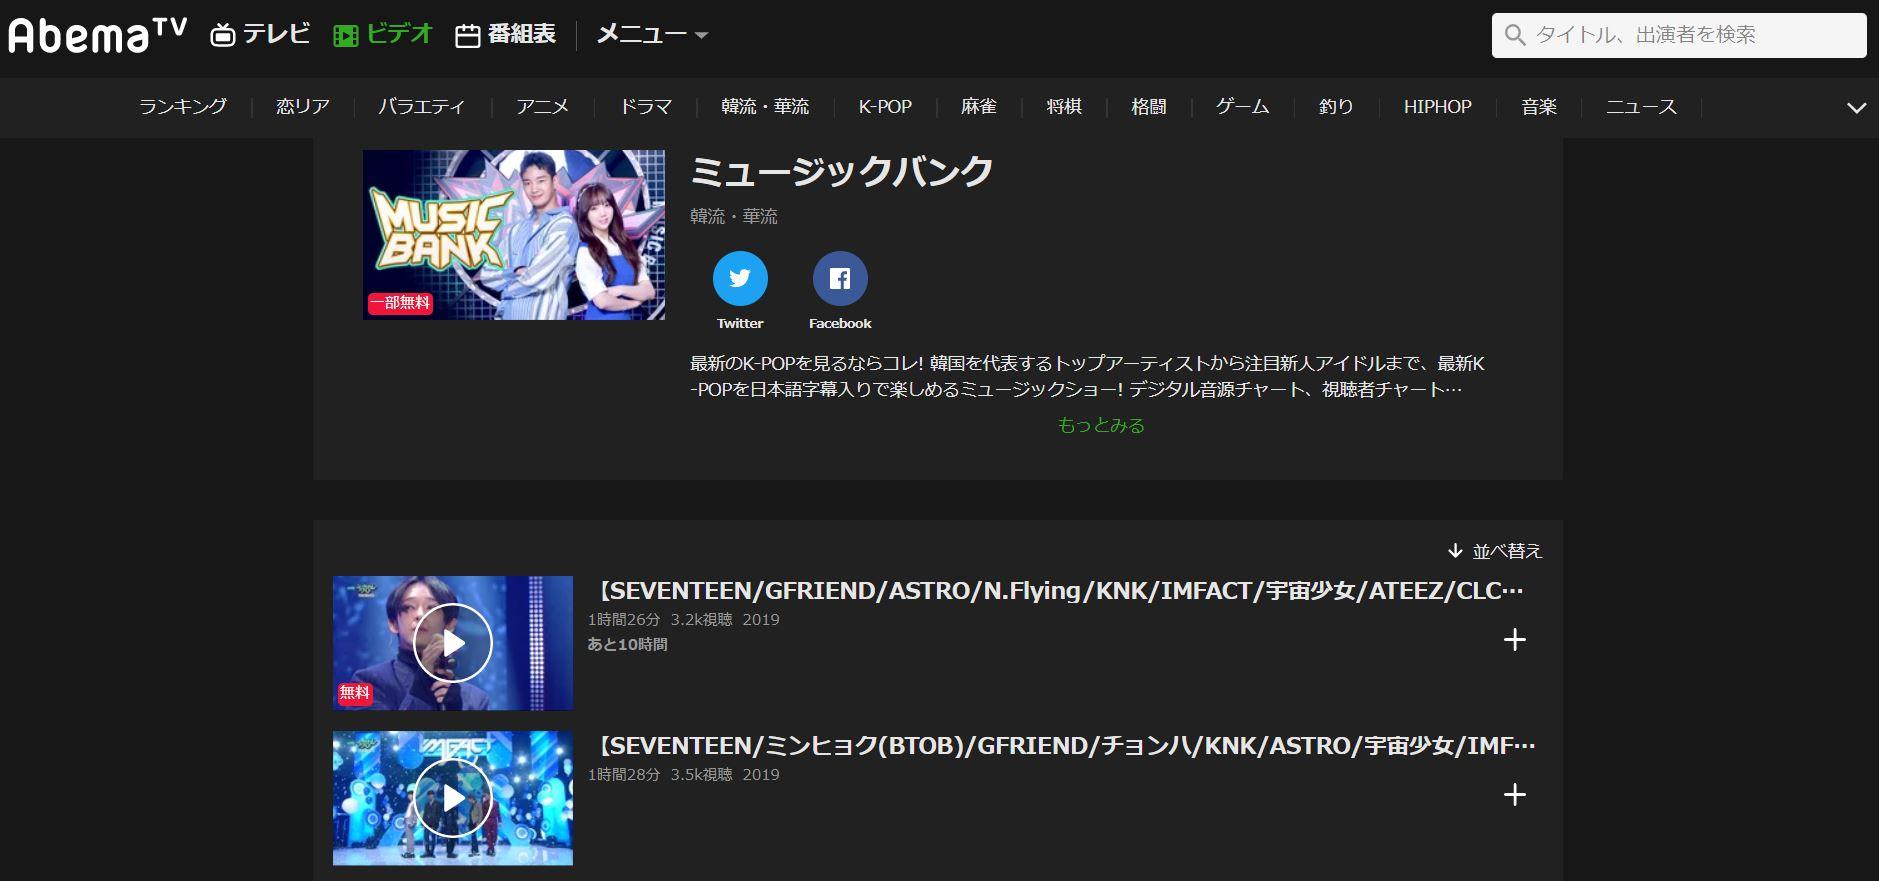 AbemaTVでミュージックバンクを視聴